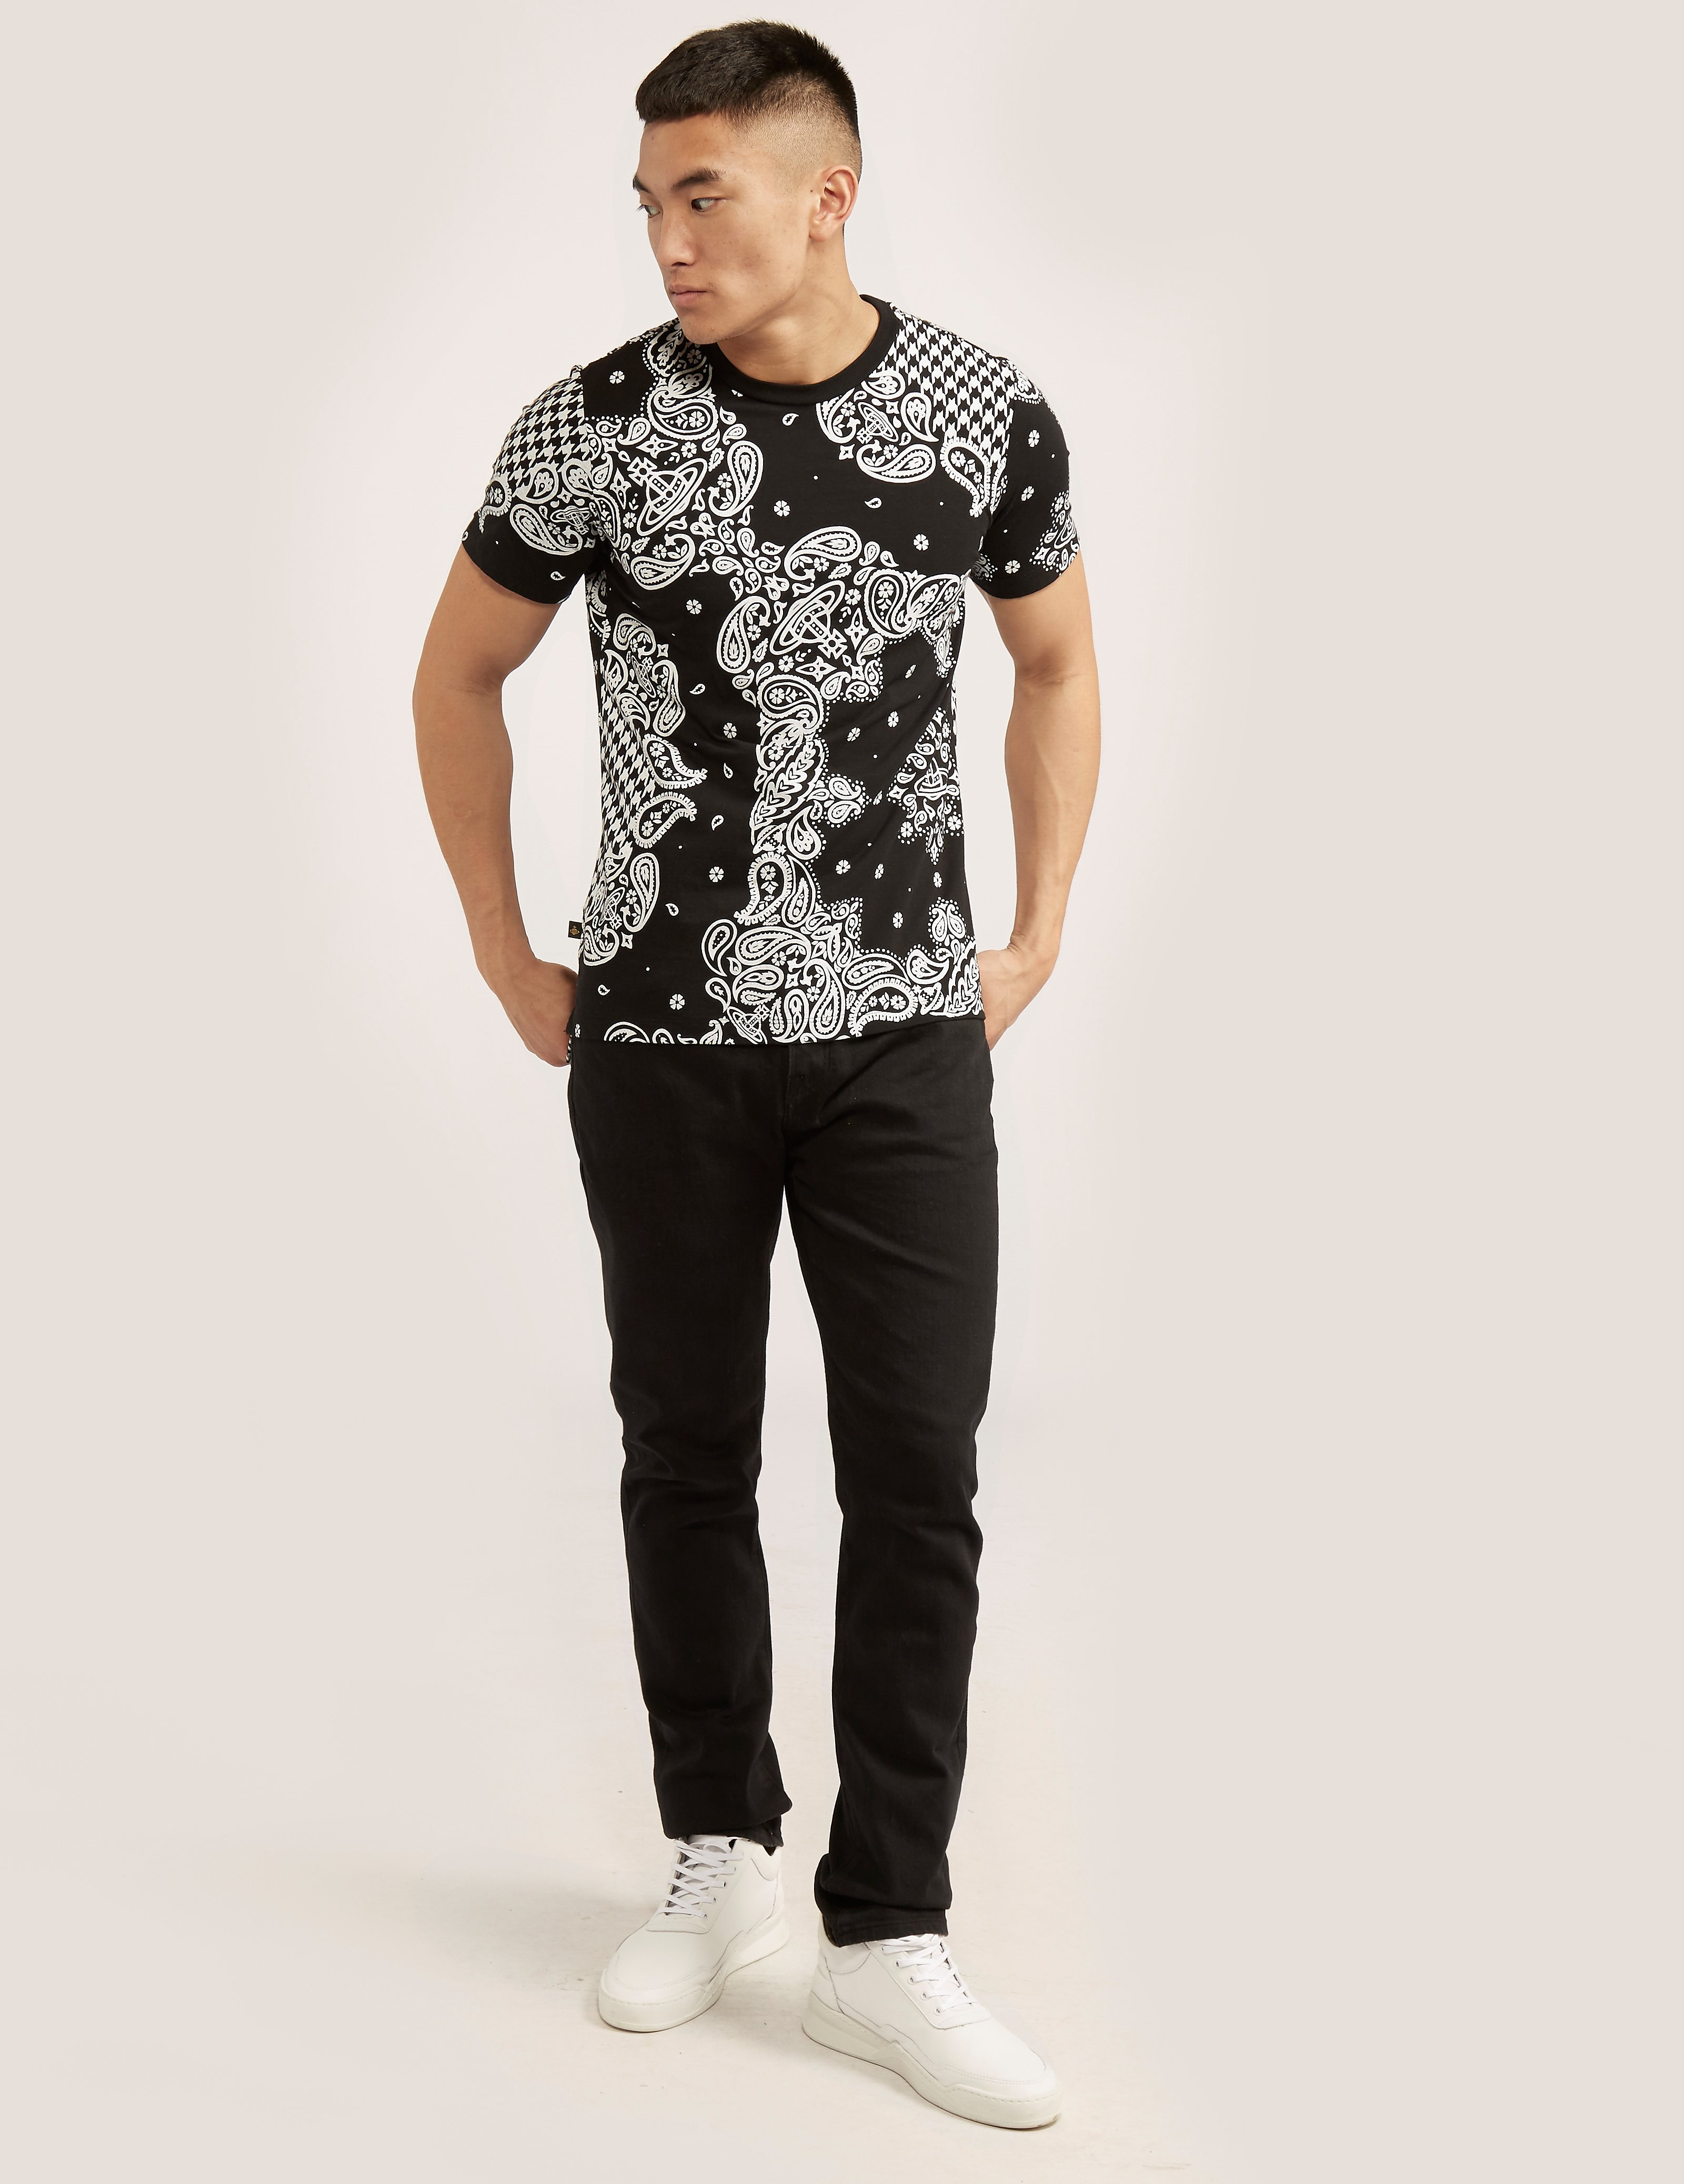 Vivienne Westwood Paisley Orb T-Shirt